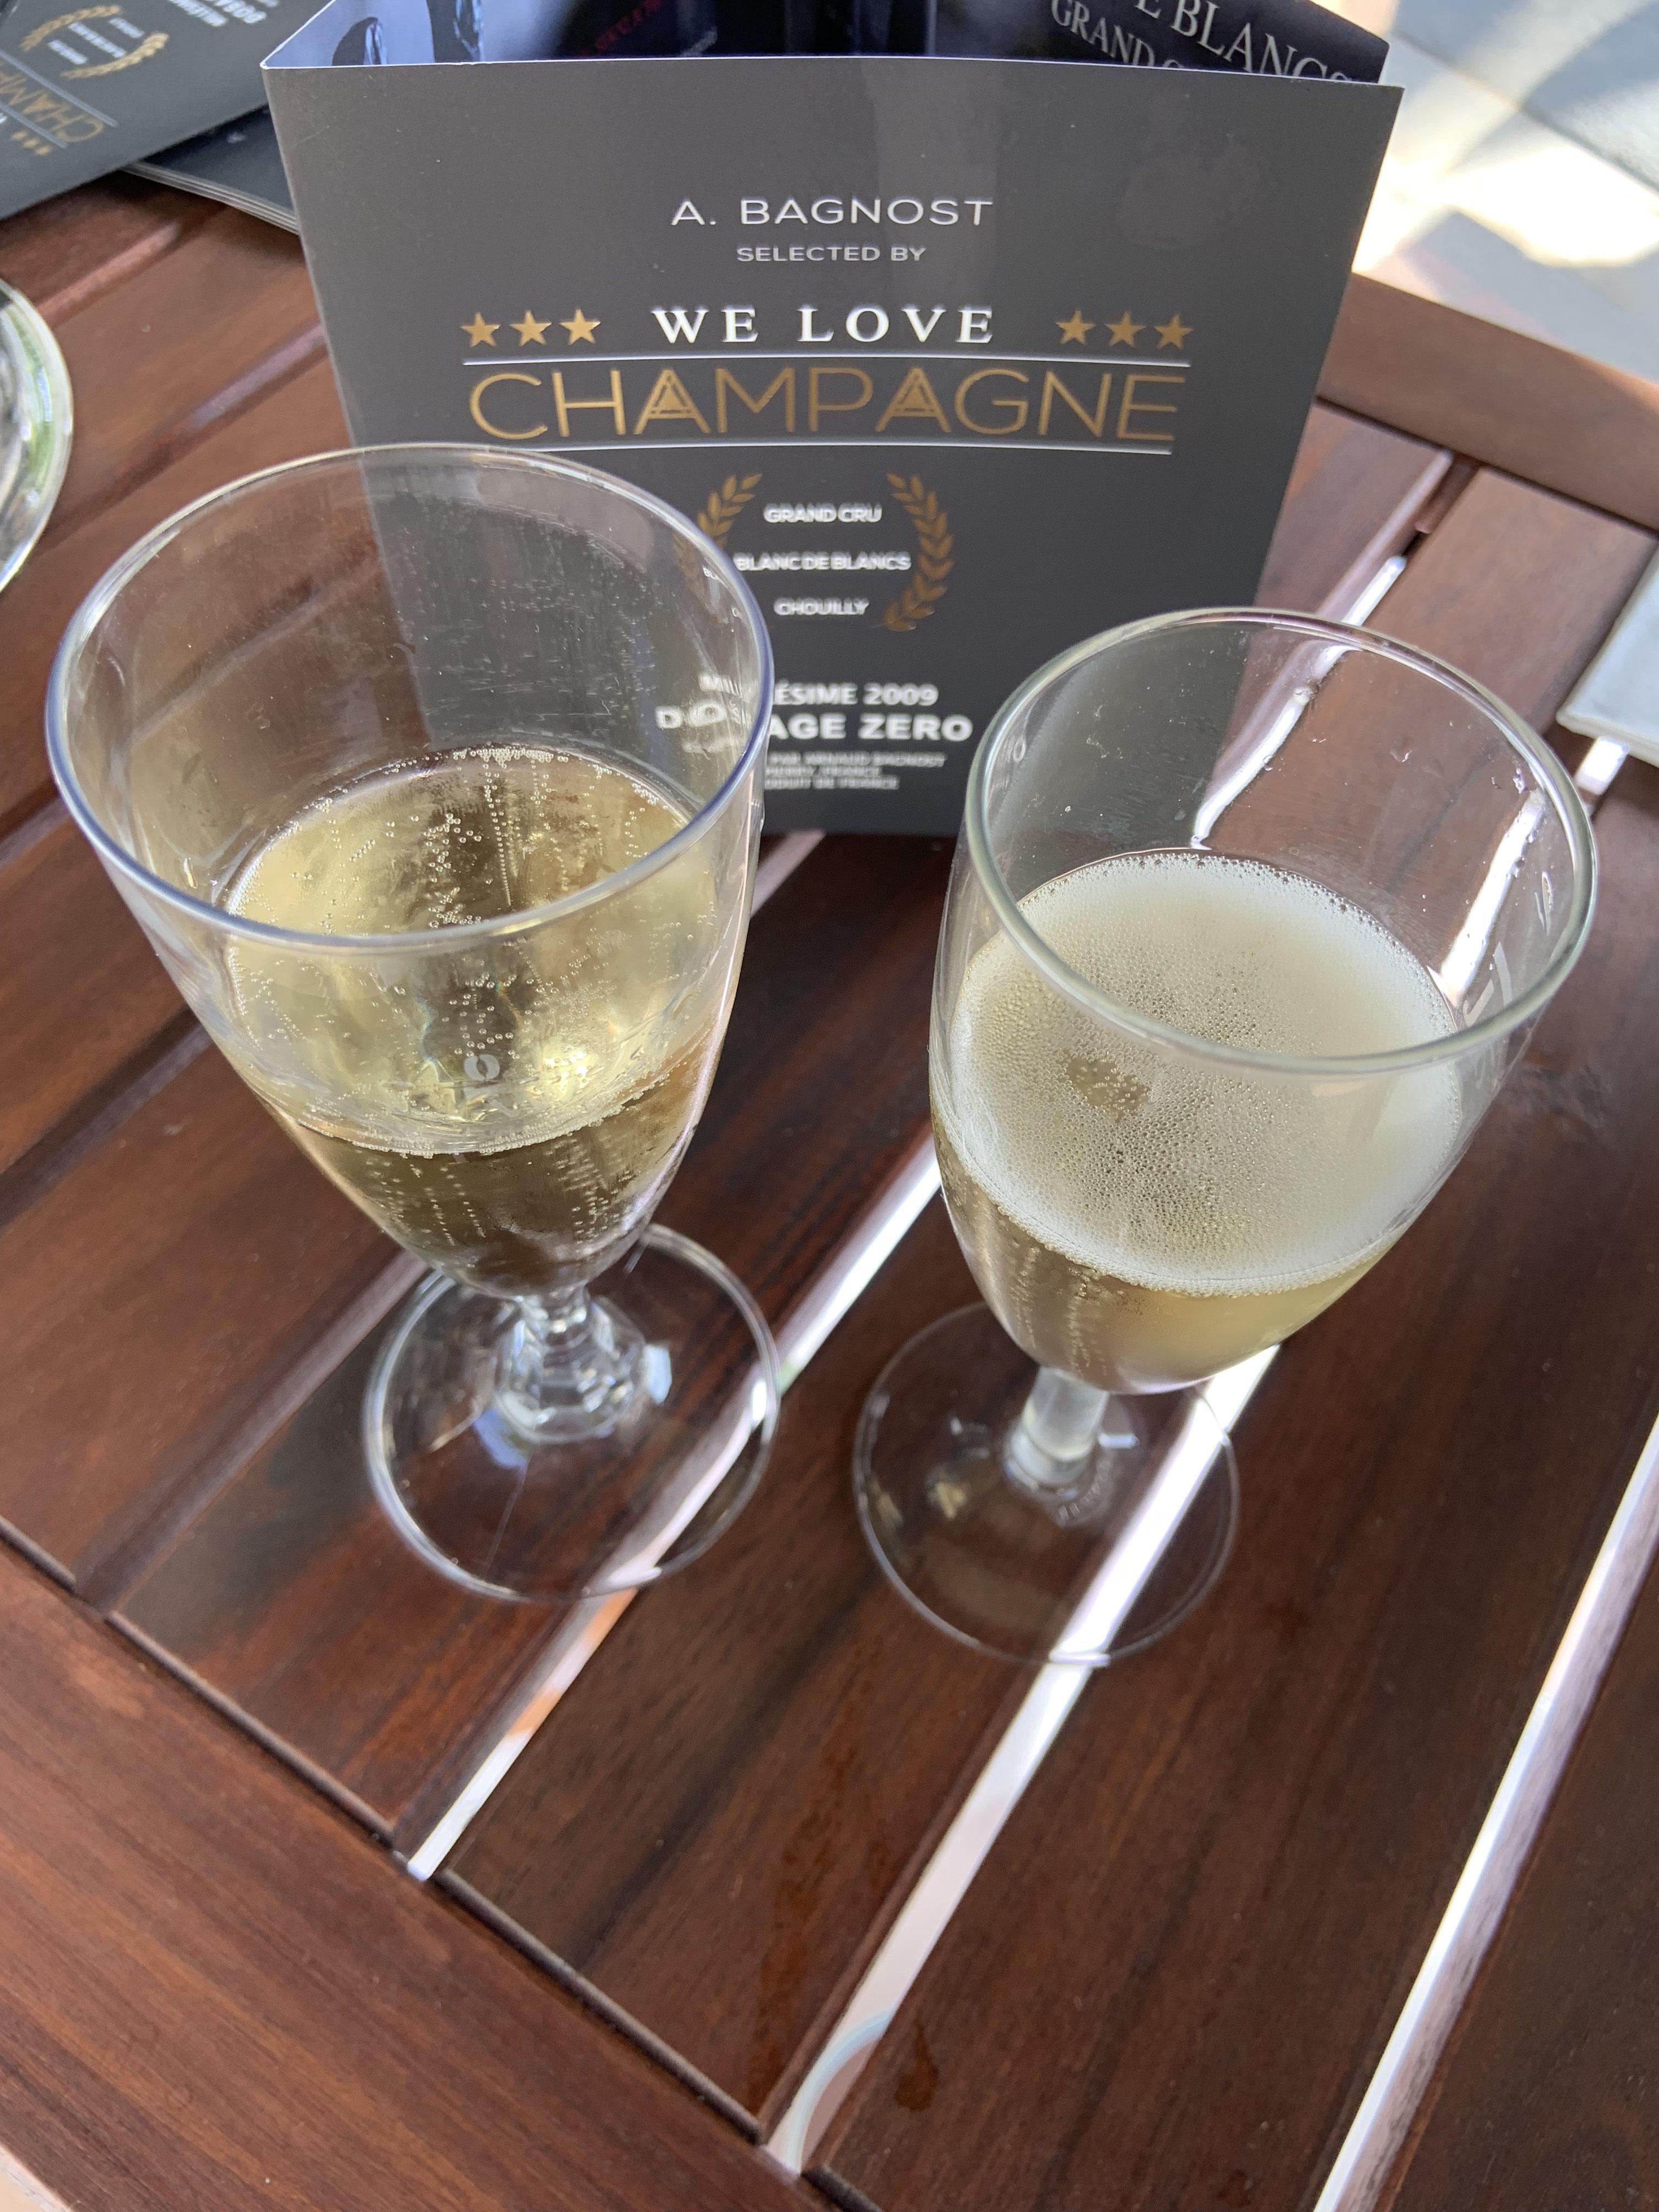 we love champagne, champagner online kaufen, Blanc de blanc online kaufen, champagner in rüsselsheim kaufen, wein in rüsselheim, champagner im Rheinmain gebiet kaufen, champagner günstig, günstiger champagner, Qualitäts champagner, don perignon, moet chan